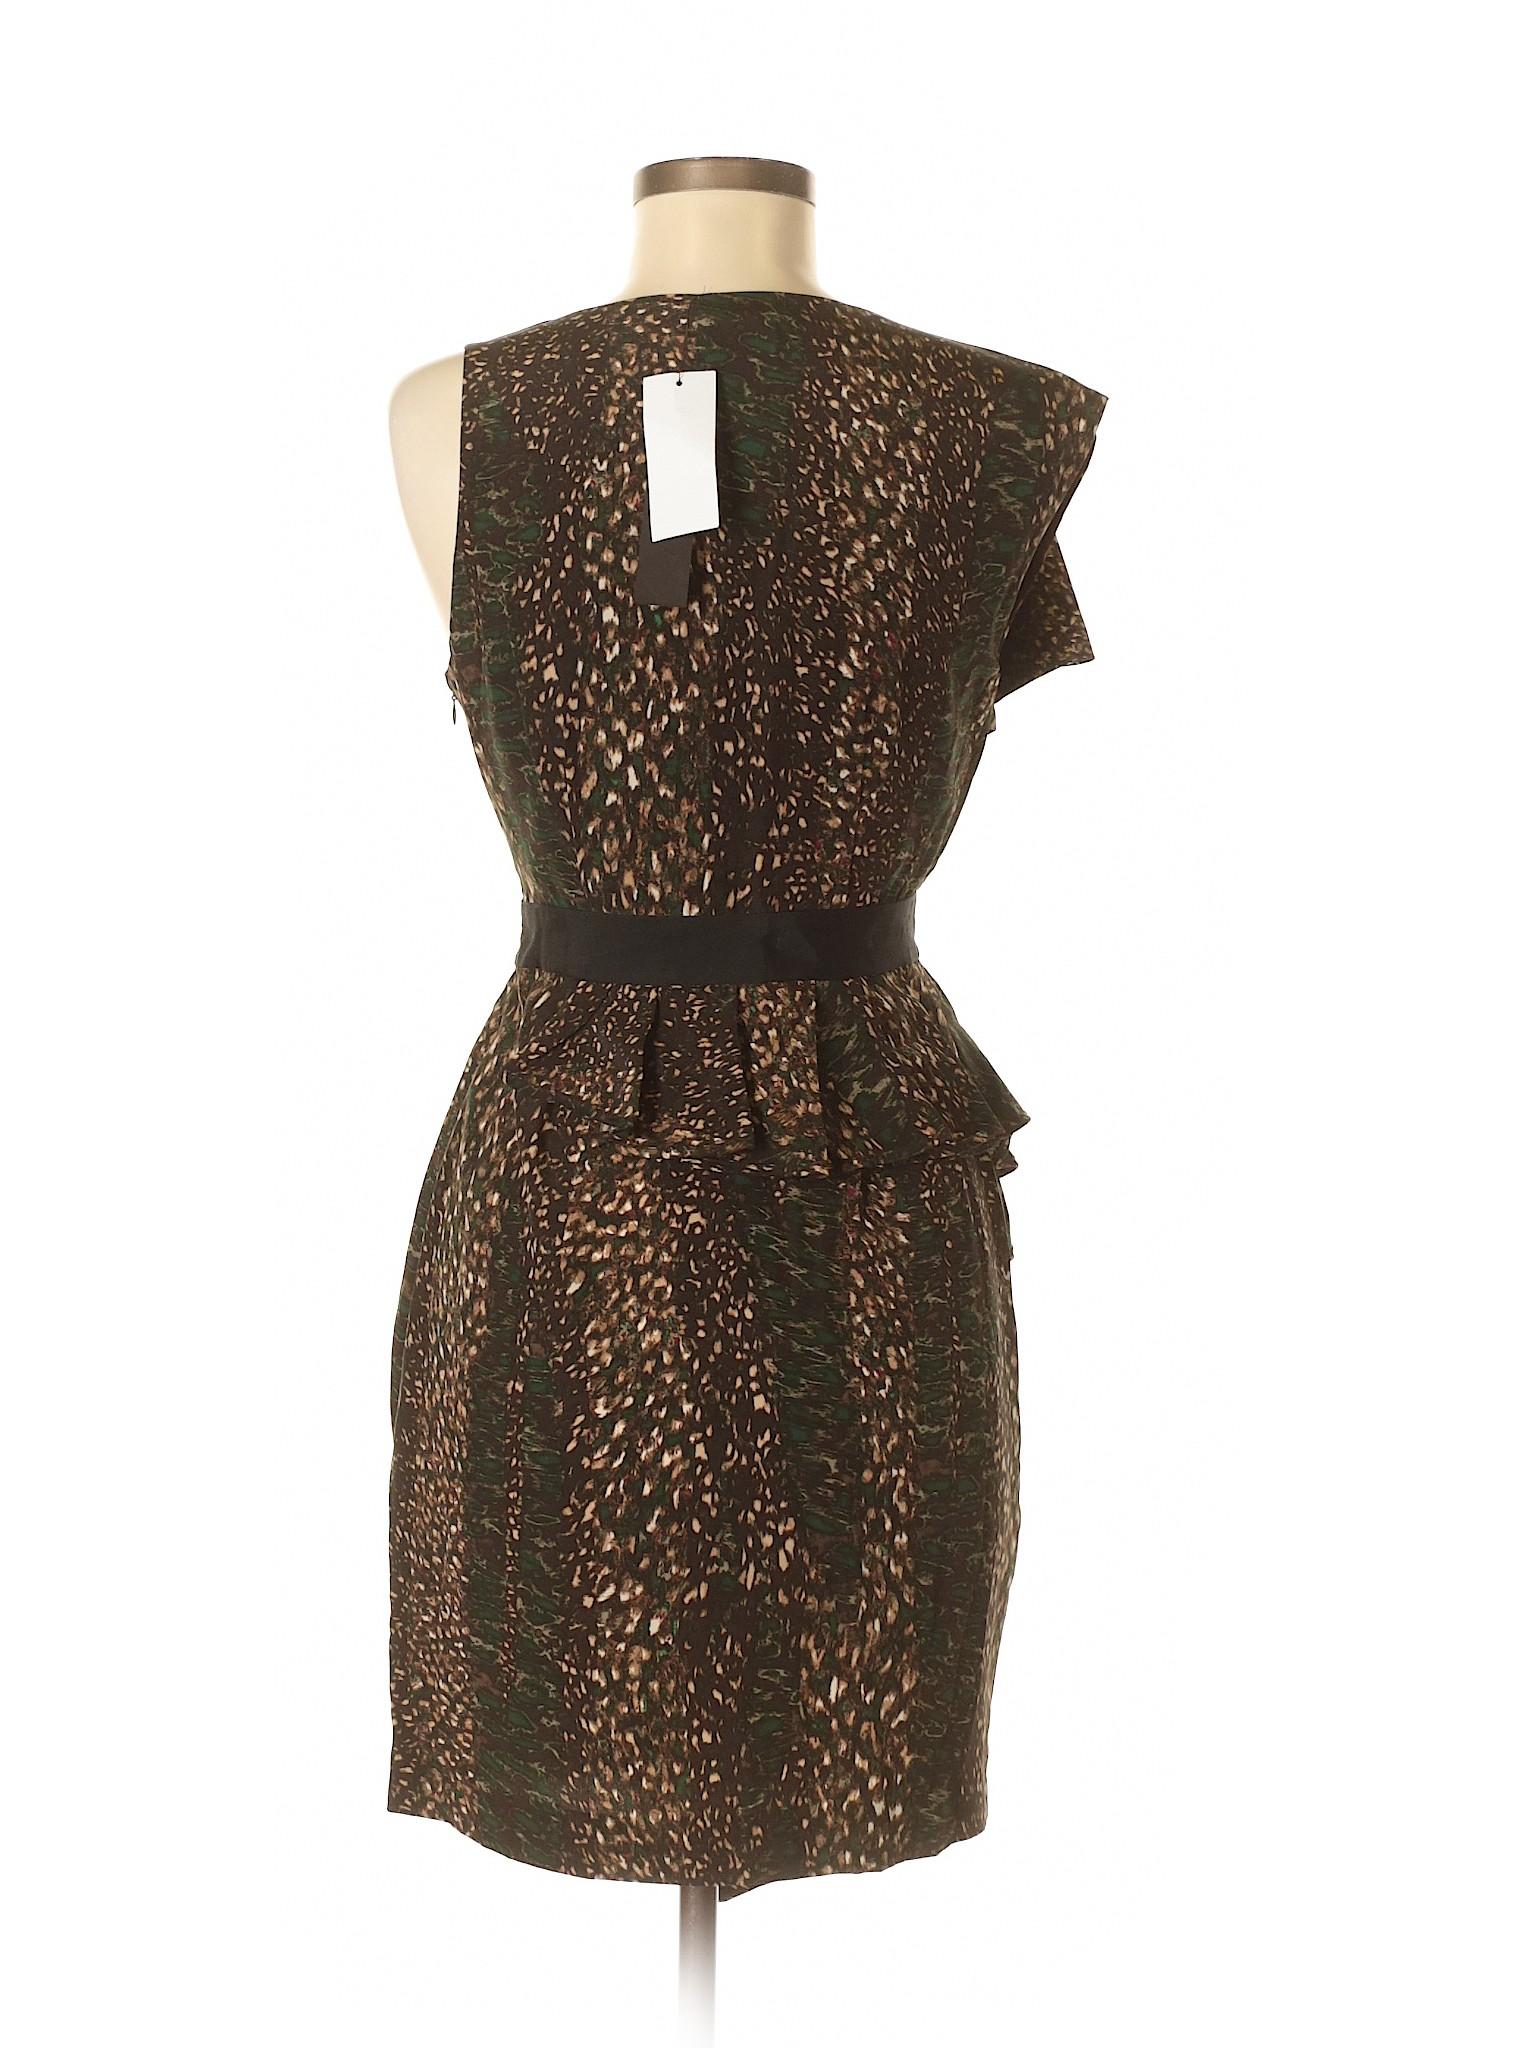 Cynthia Steffe Casual Dress winter Boutique PRqwU54n